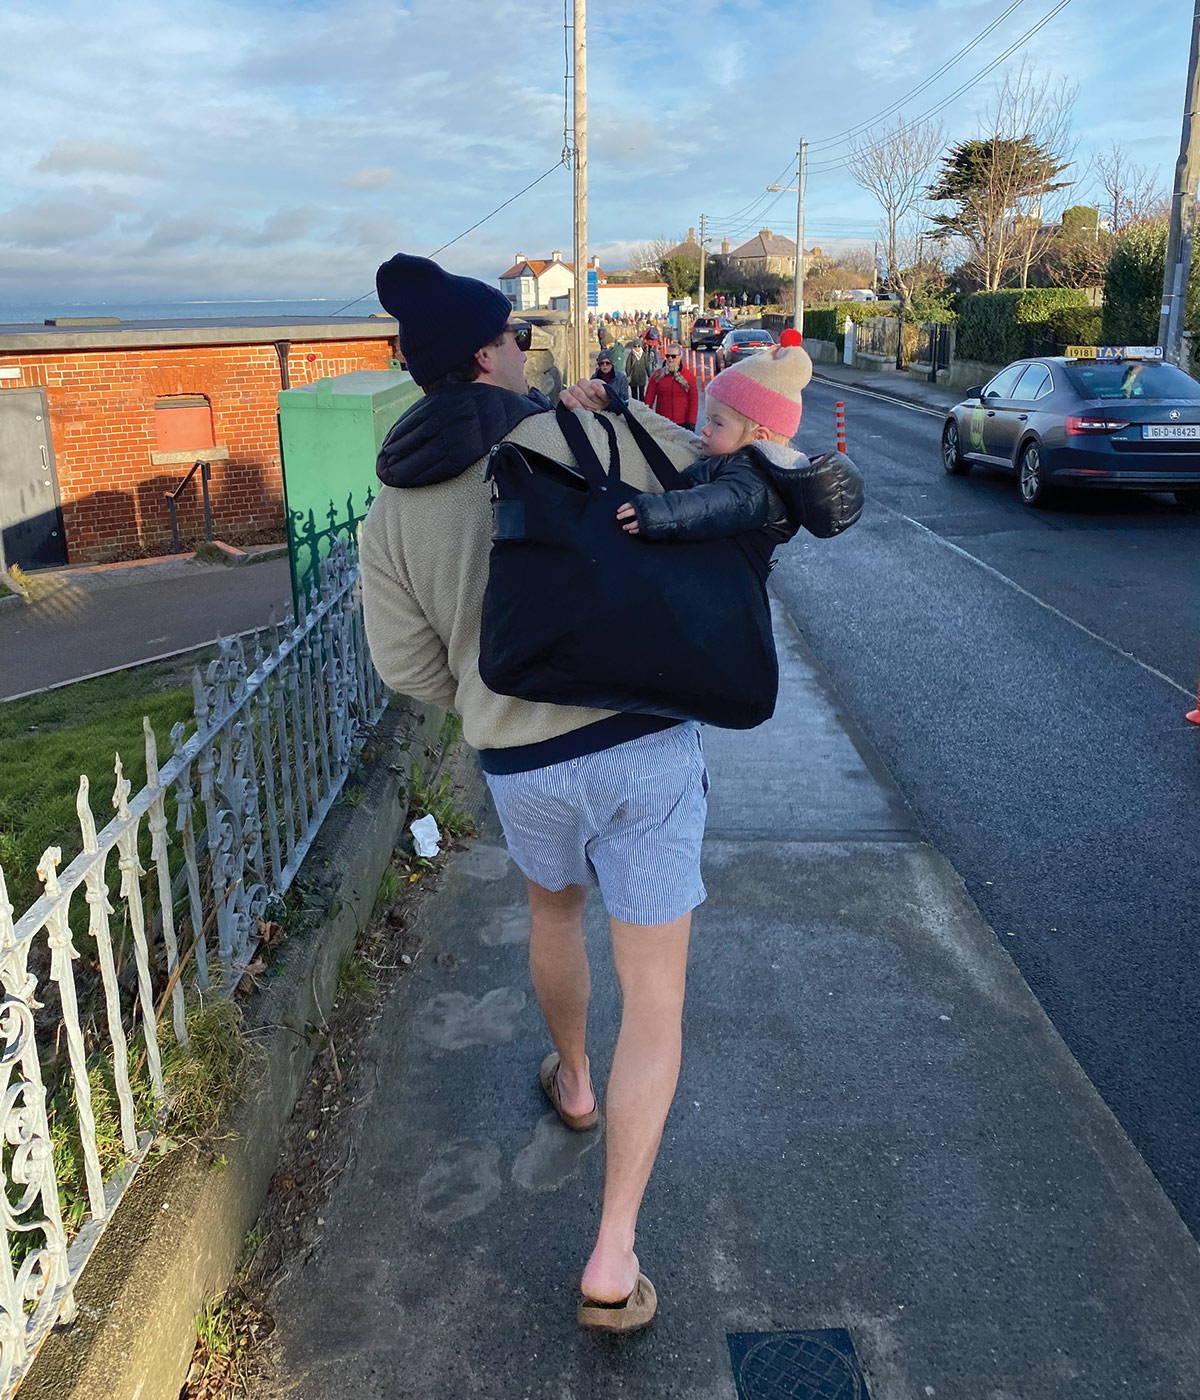 Jonathan Legge Carrying his Daughter in the Freddie